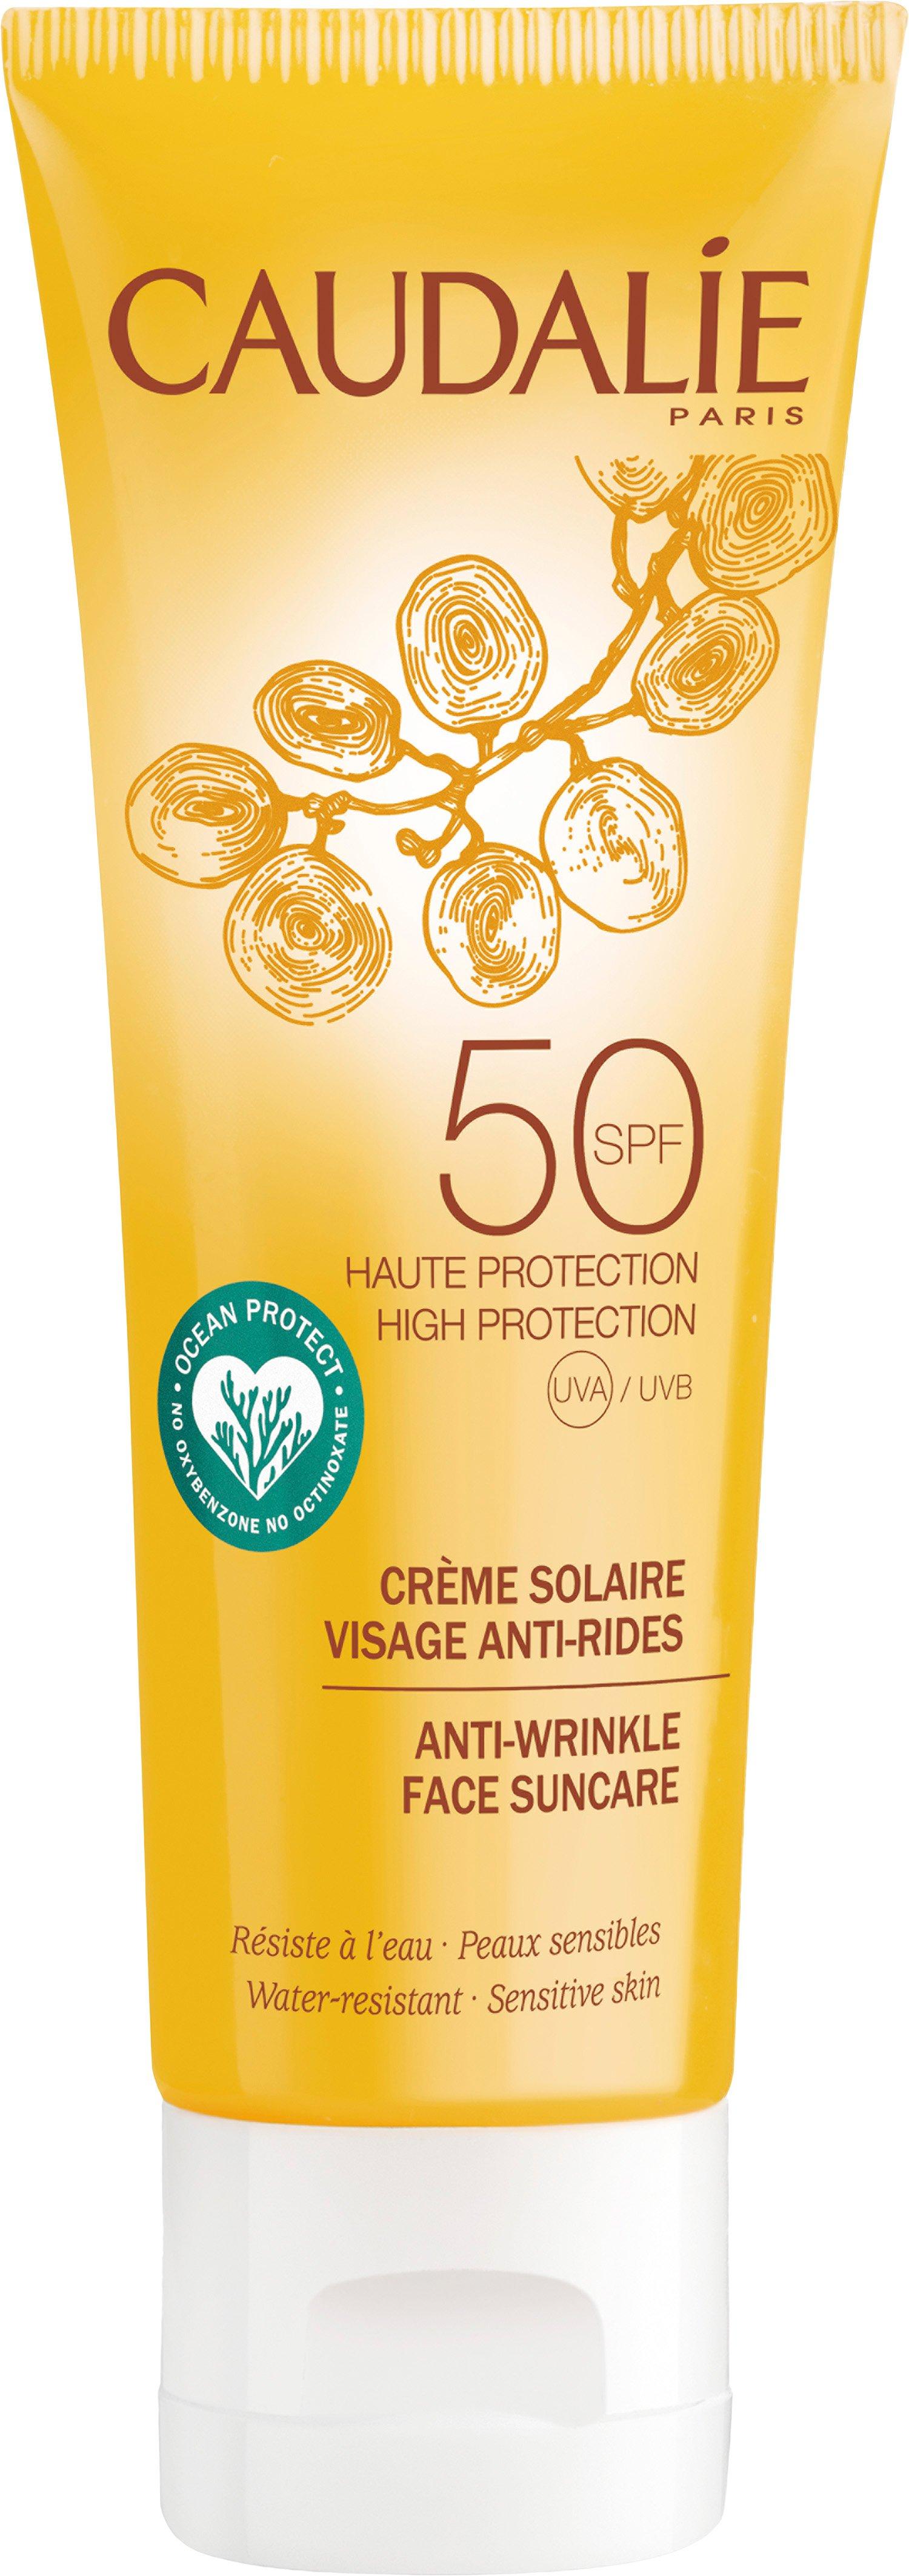 Caudalie - Anti-wrinkle Face Suncare SPF 50 50 ml